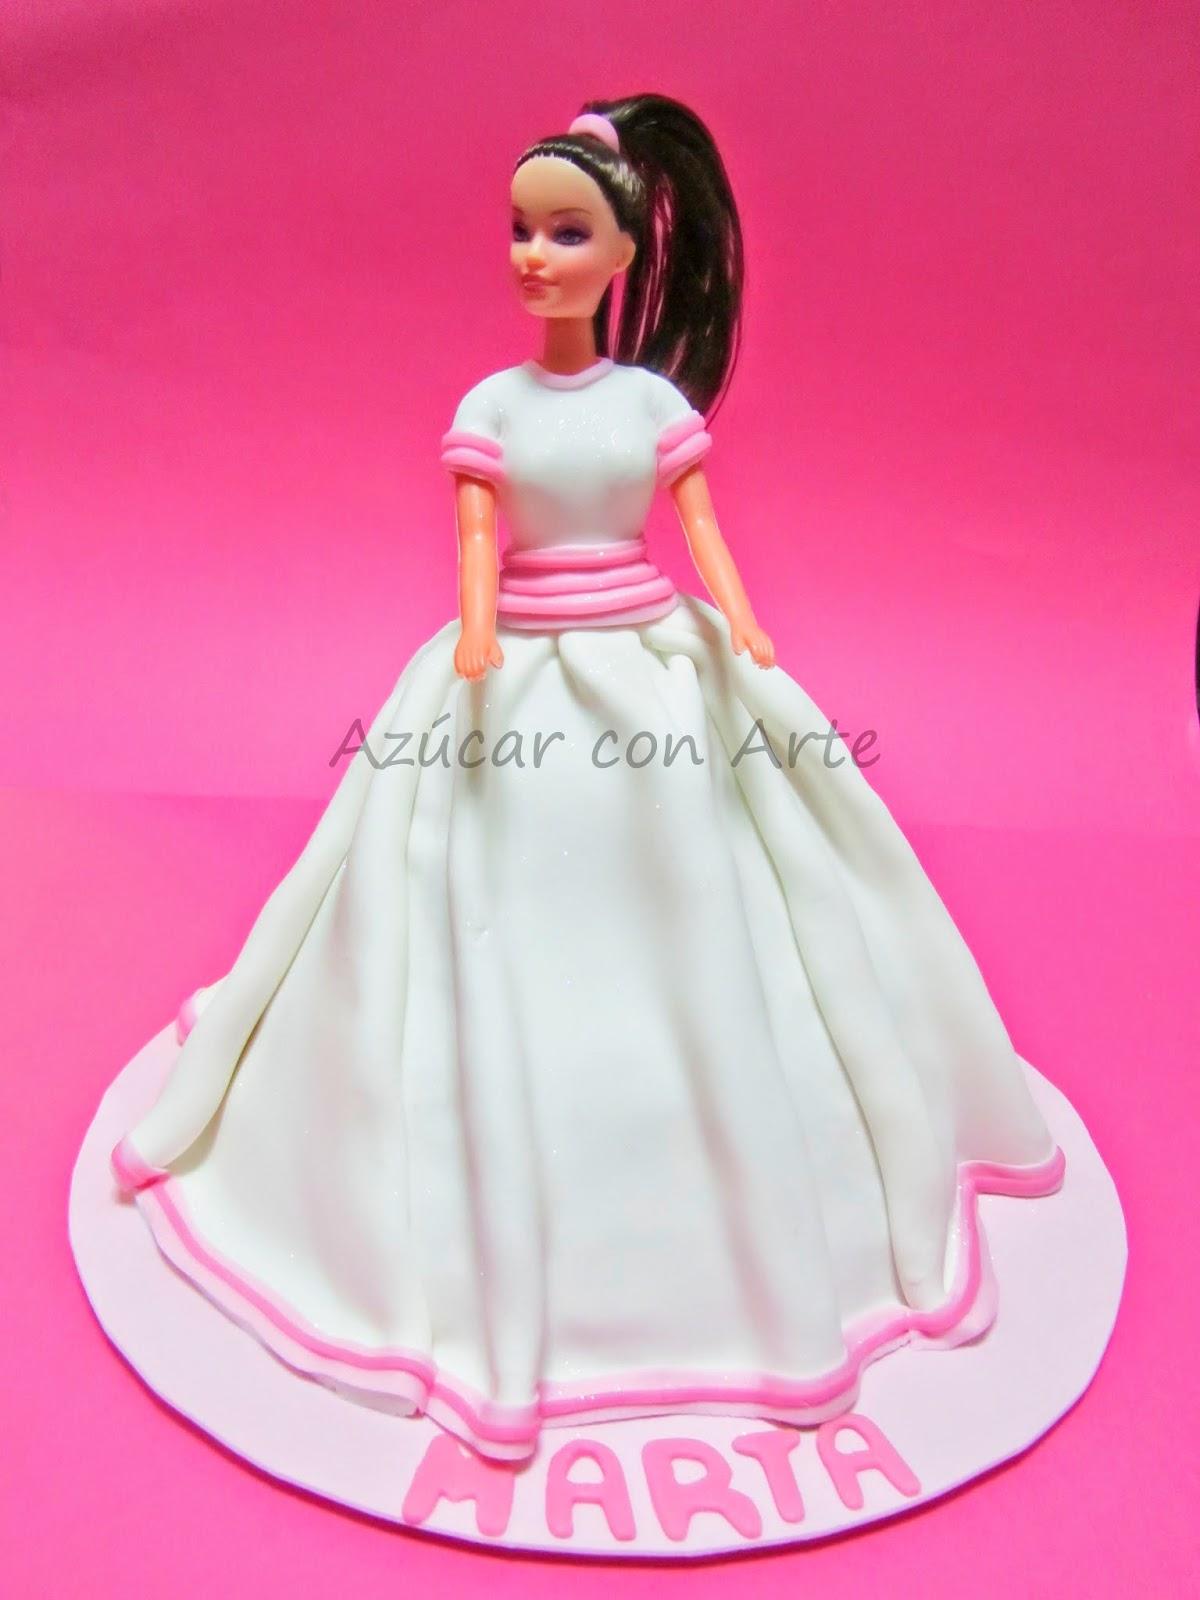 tarta barbie,tarta princesa, tarta comunión, barbie cake, princess cake, tarta sin gluten, gluten free cake | azucar con arte